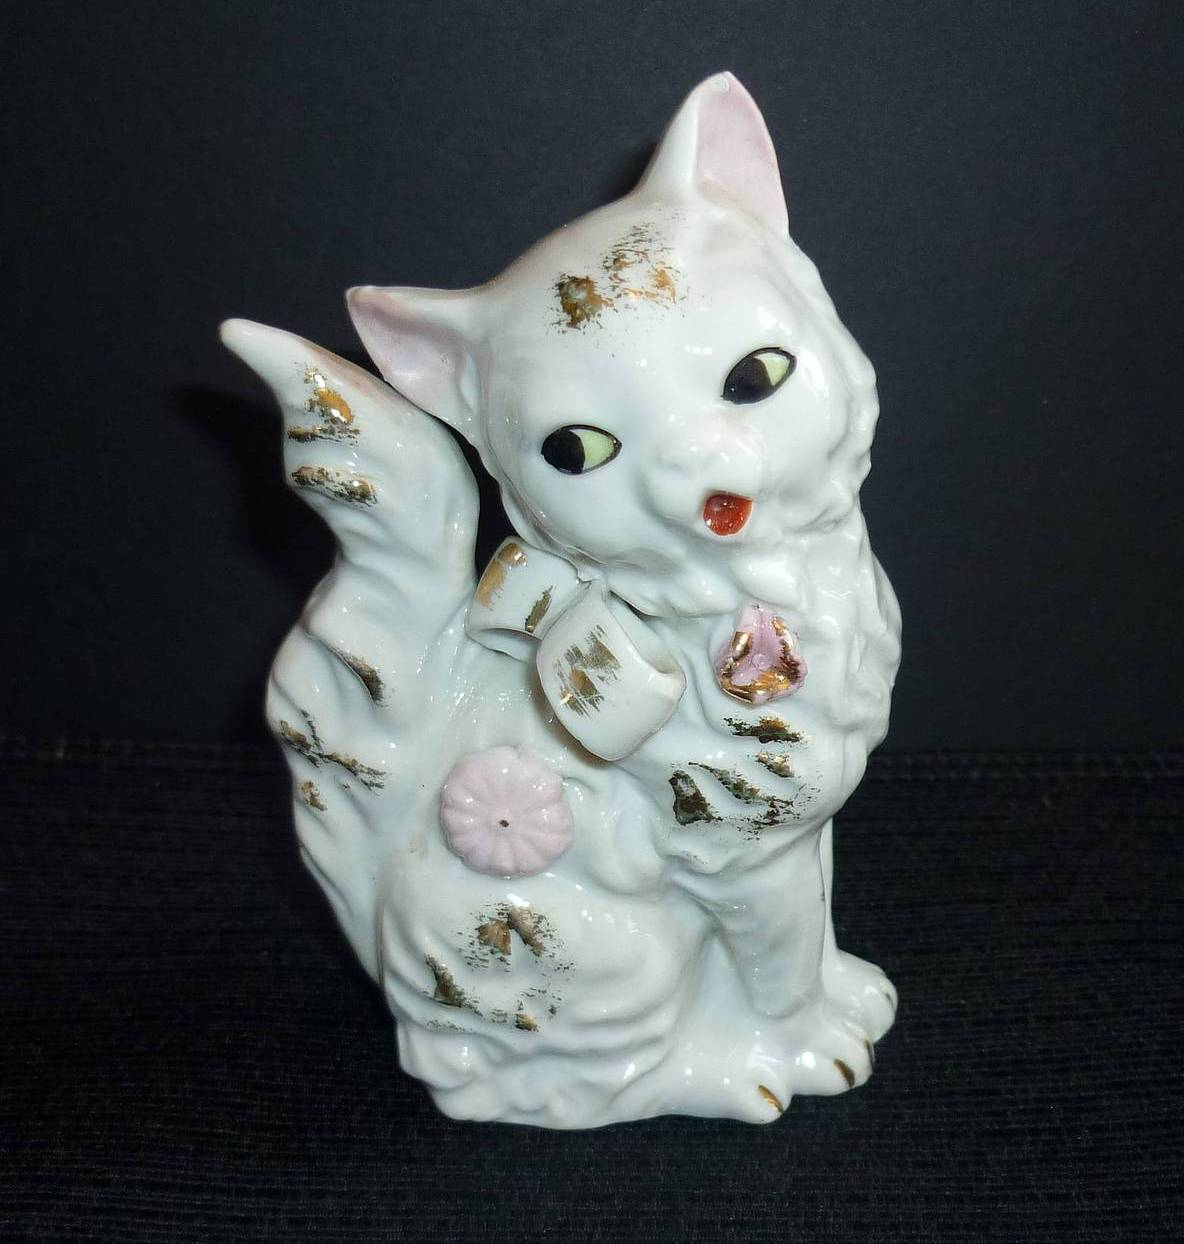 Japan white cat figurine 1